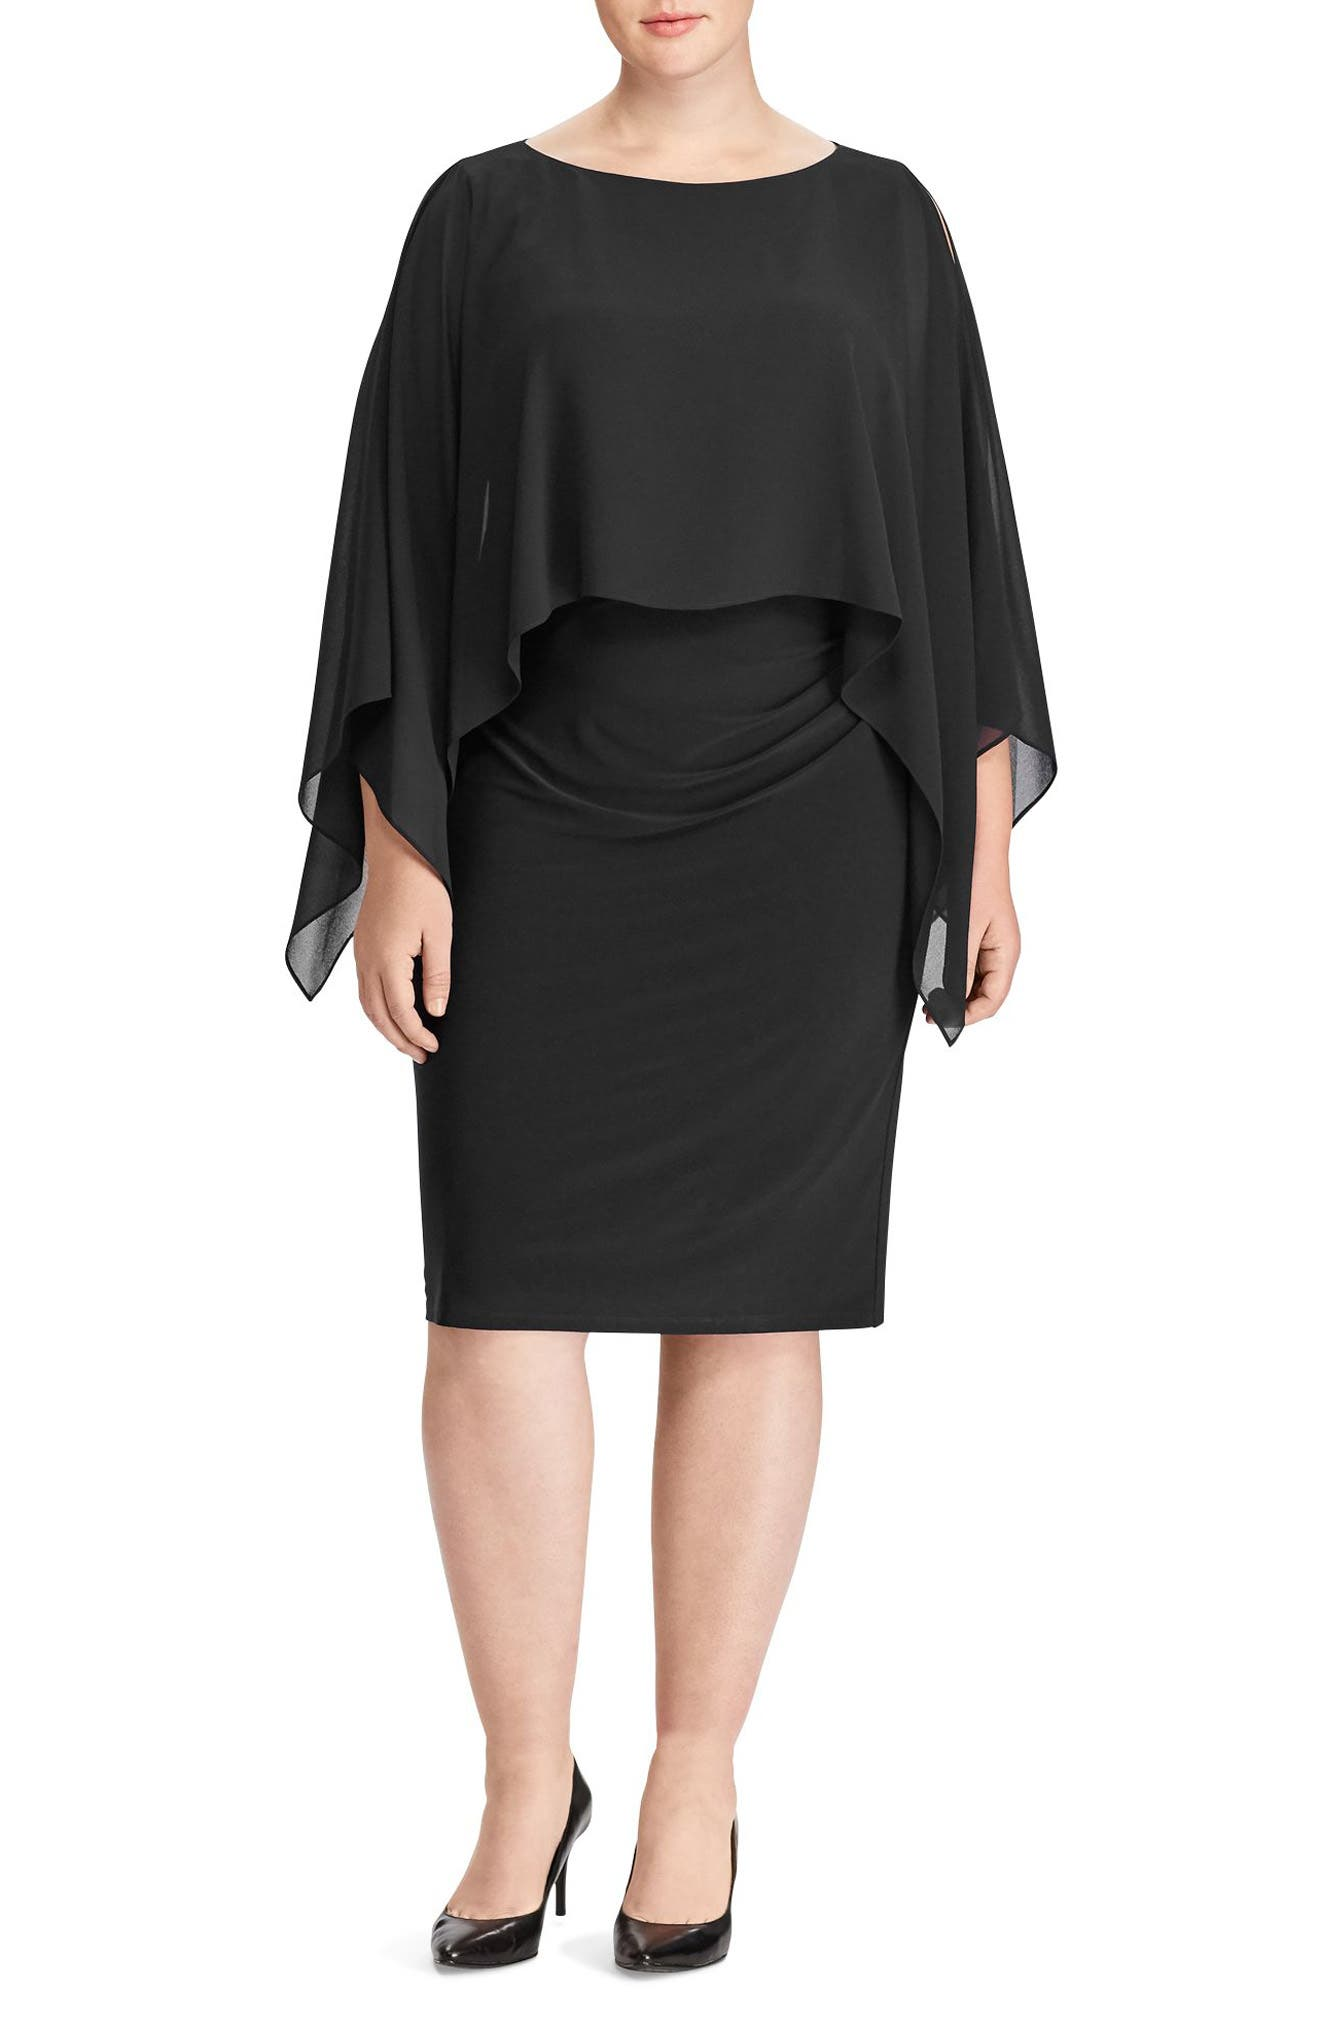 Mercinitta Dress,                         Main,                         color,